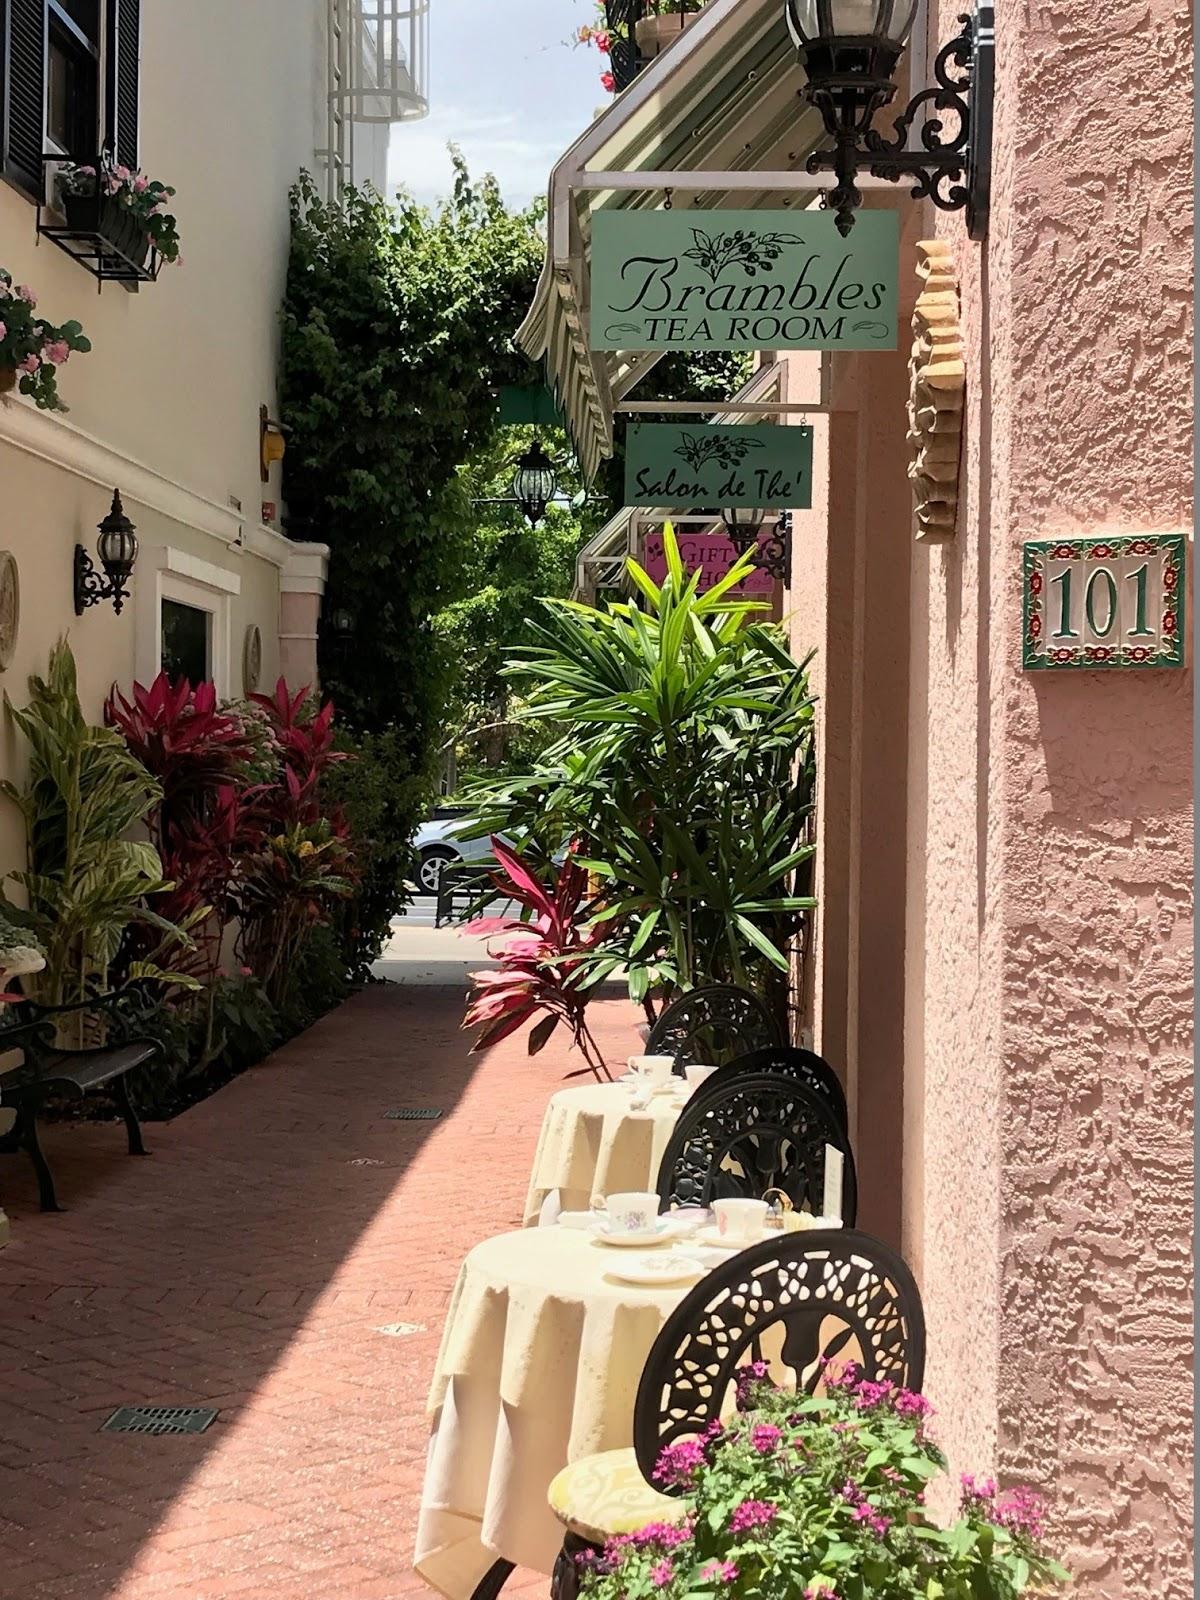 Brambles Tea Room In Naples Florida